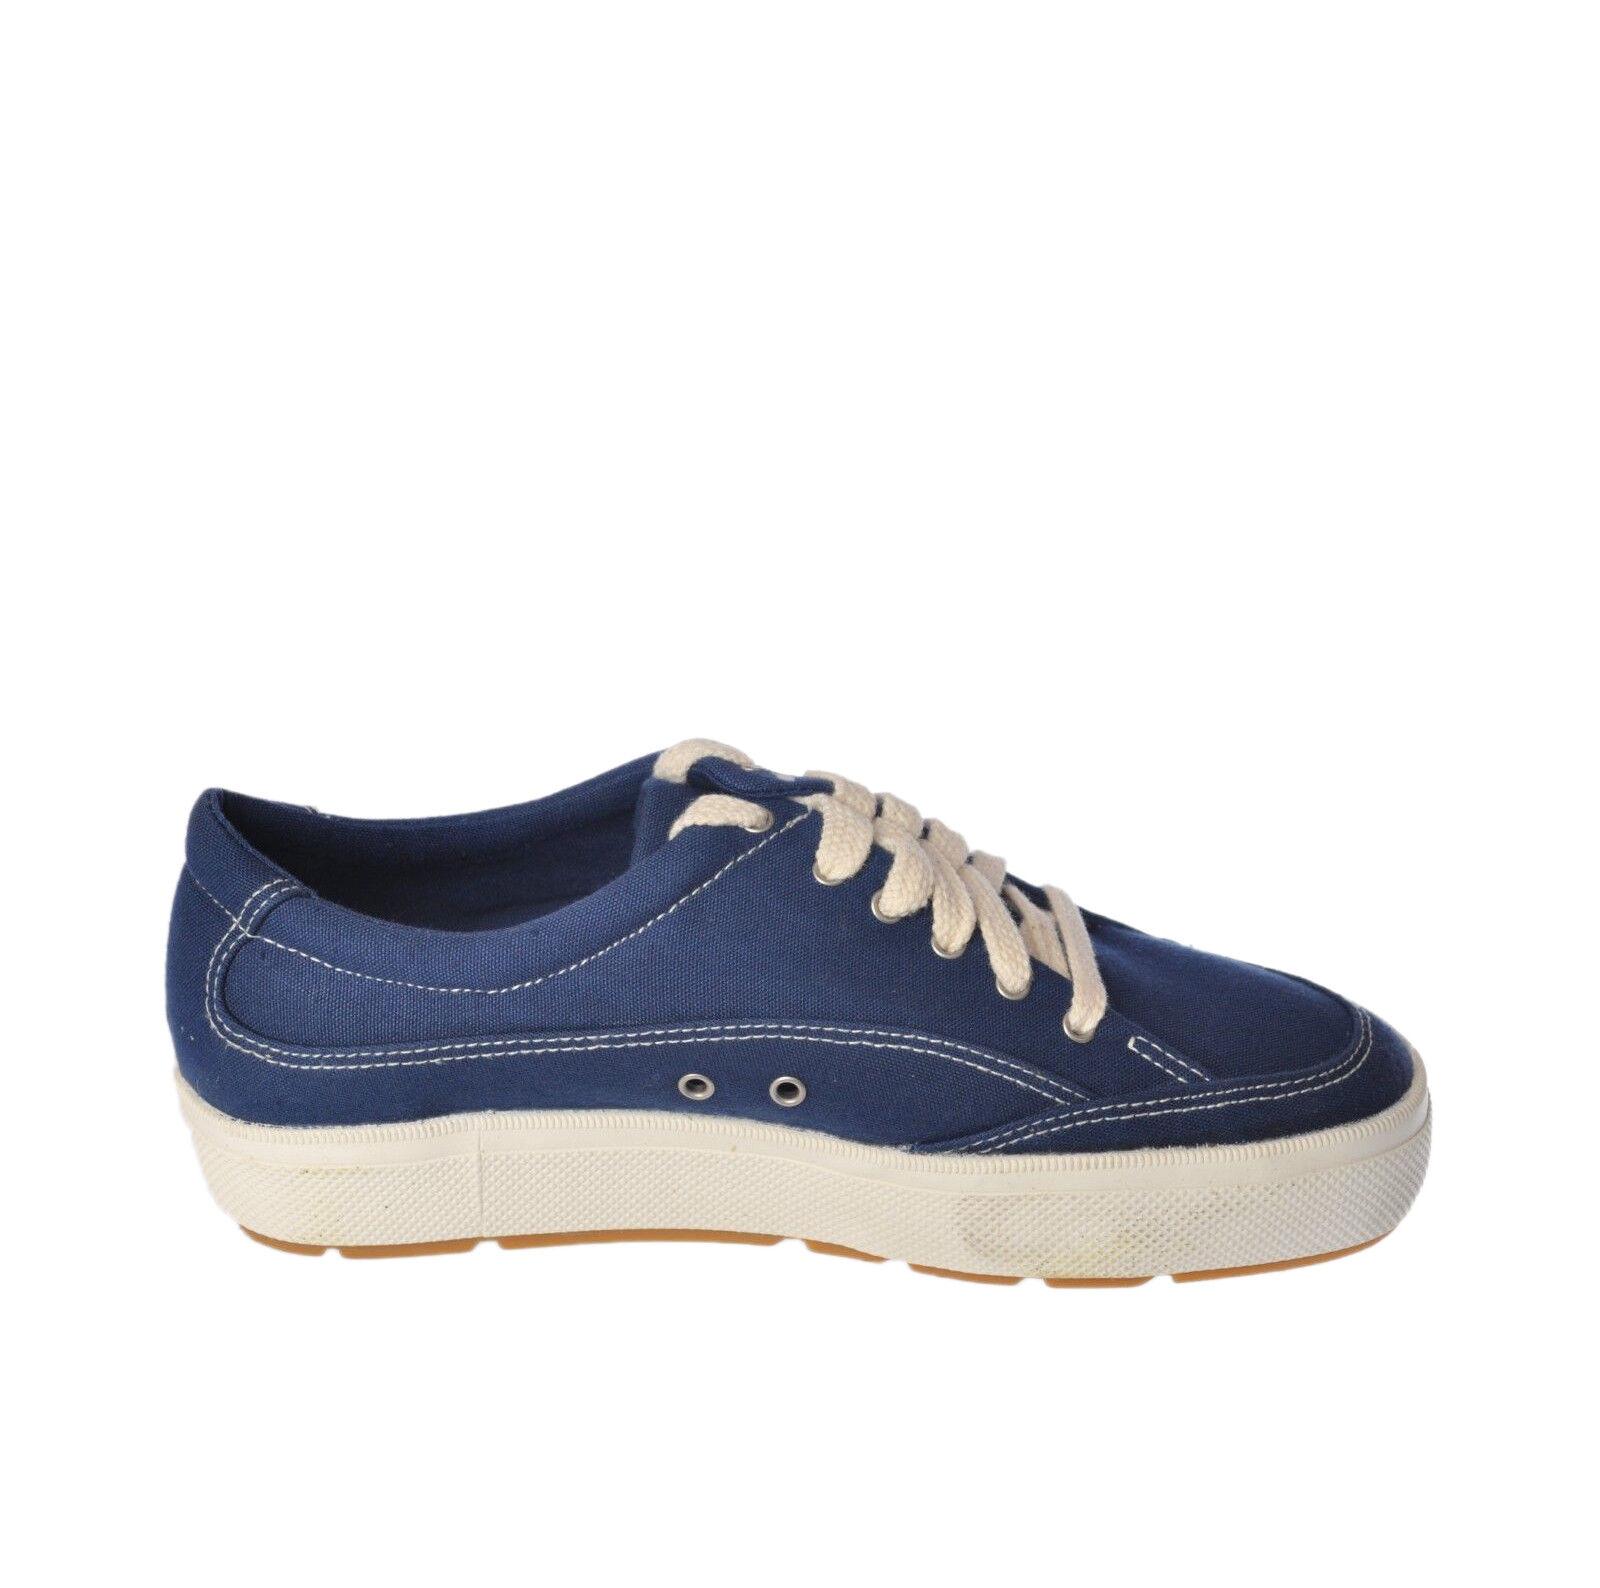 Barleycorn - Scarpe-Scarpe da Ginnastica low - Woman - Blue - 5144720C183647